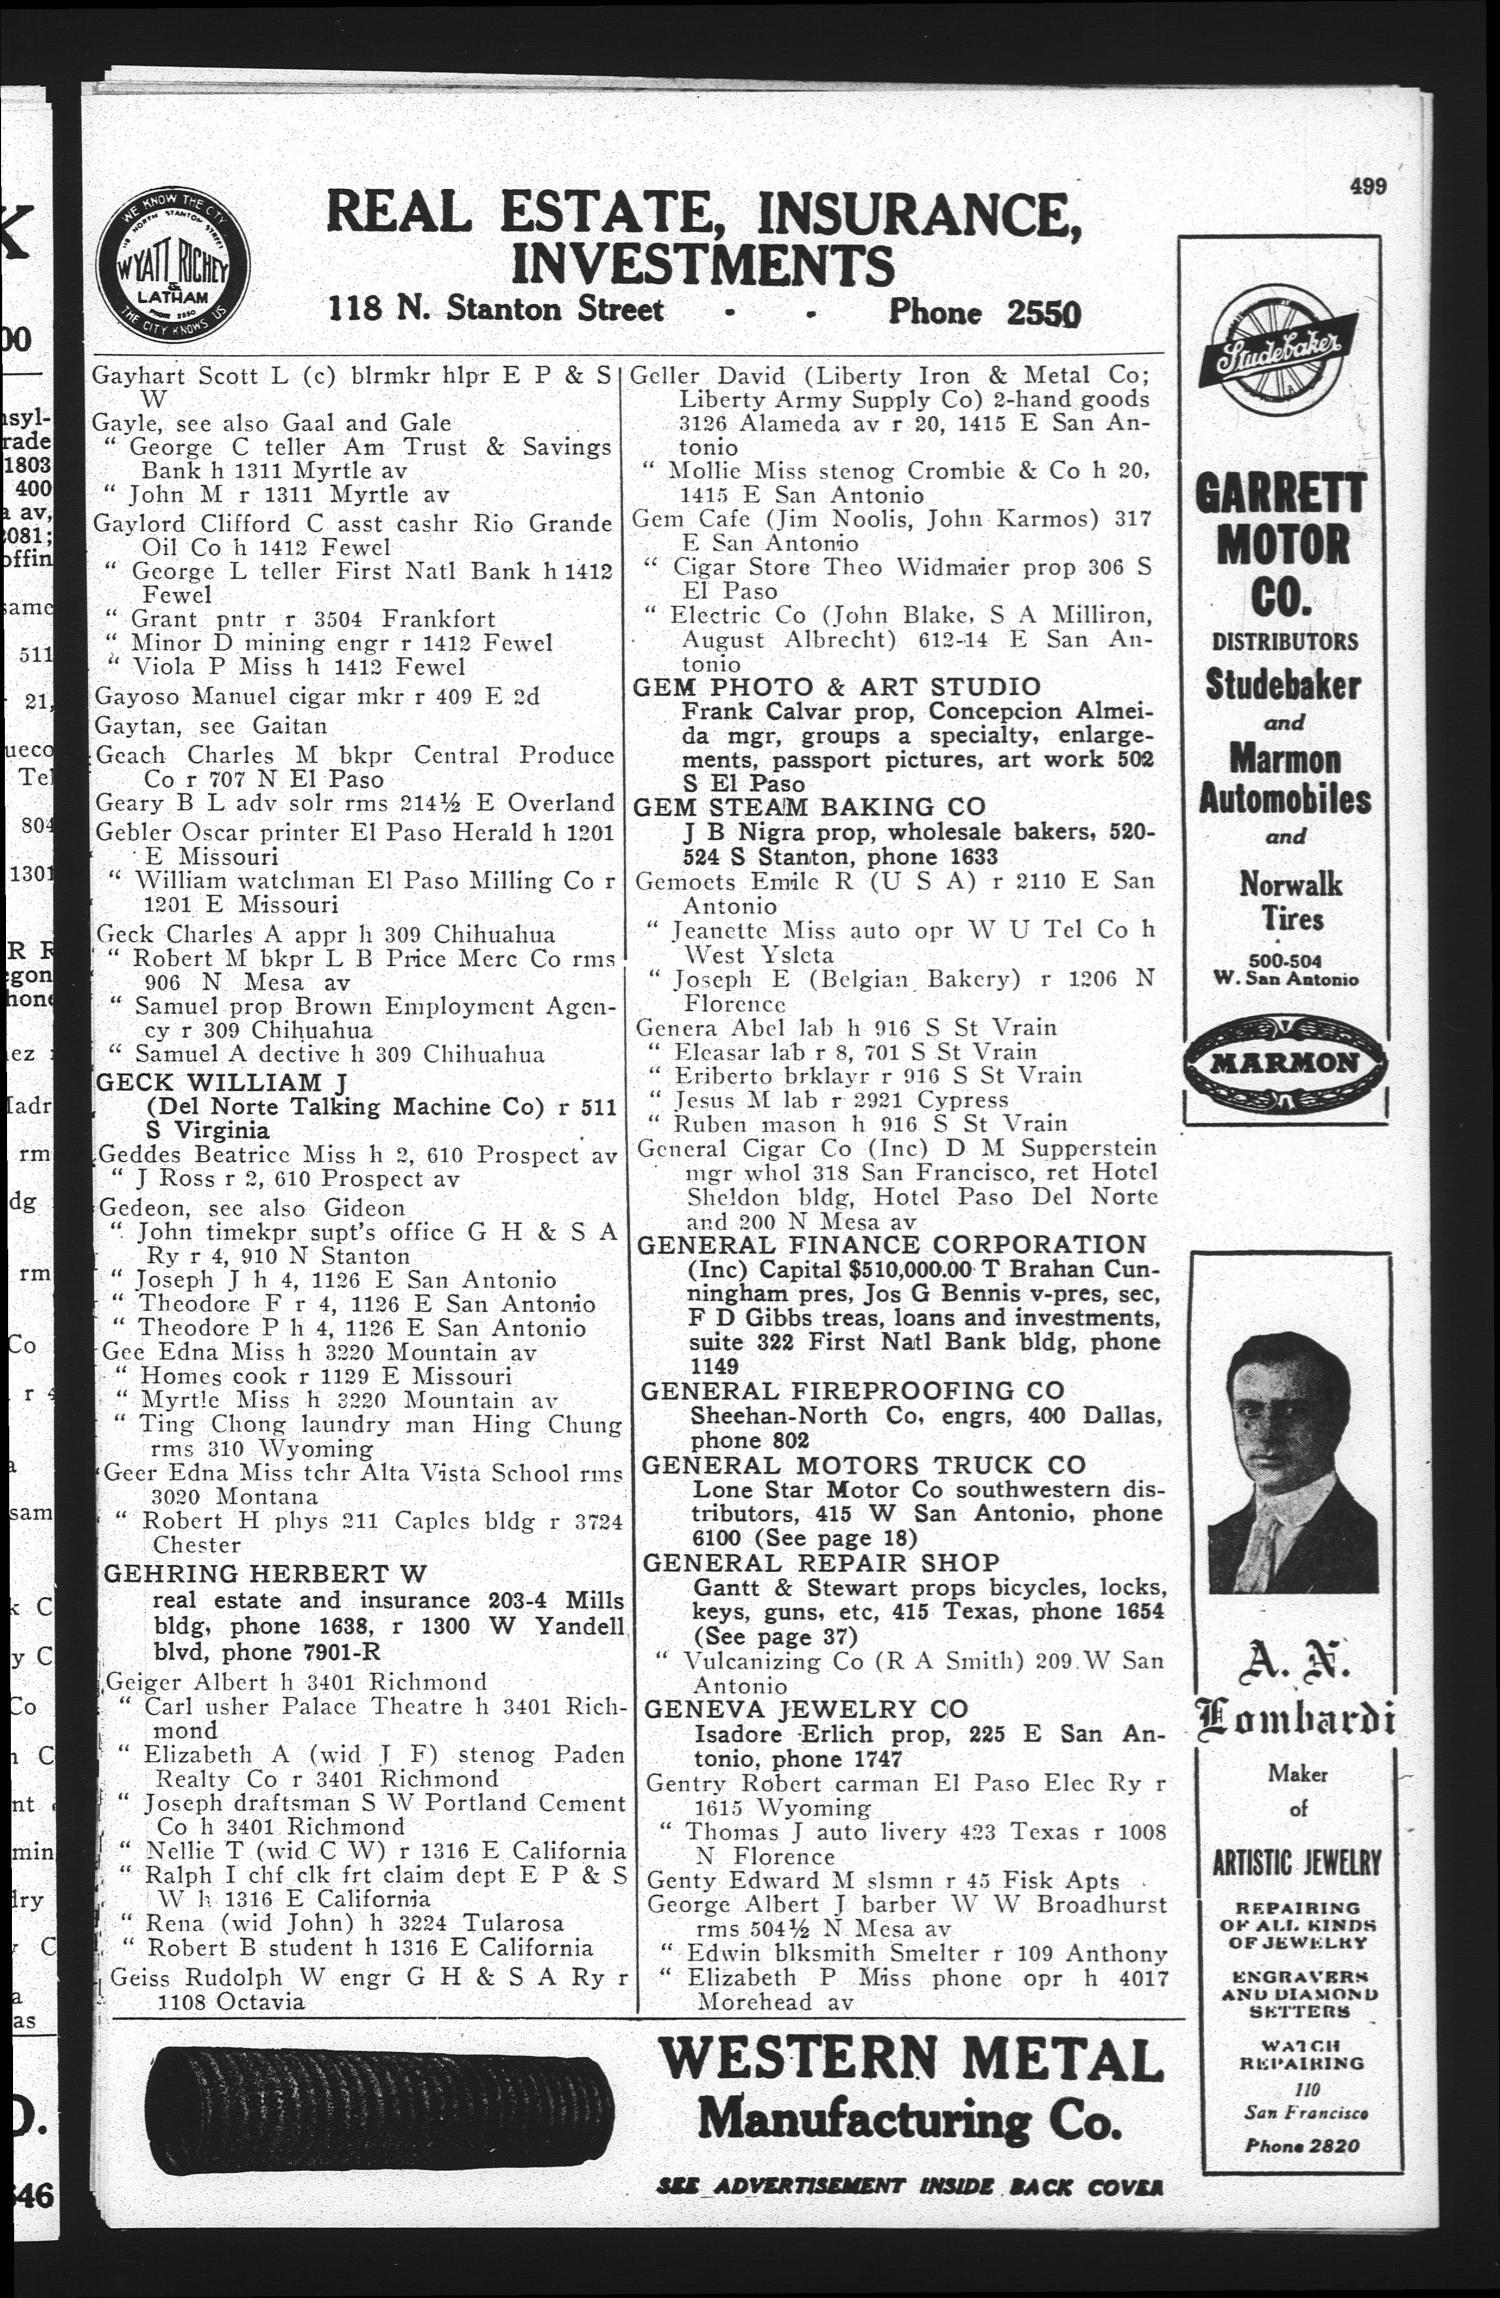 El Paso City Directory 1921 Page 499 The Portal to Texas History